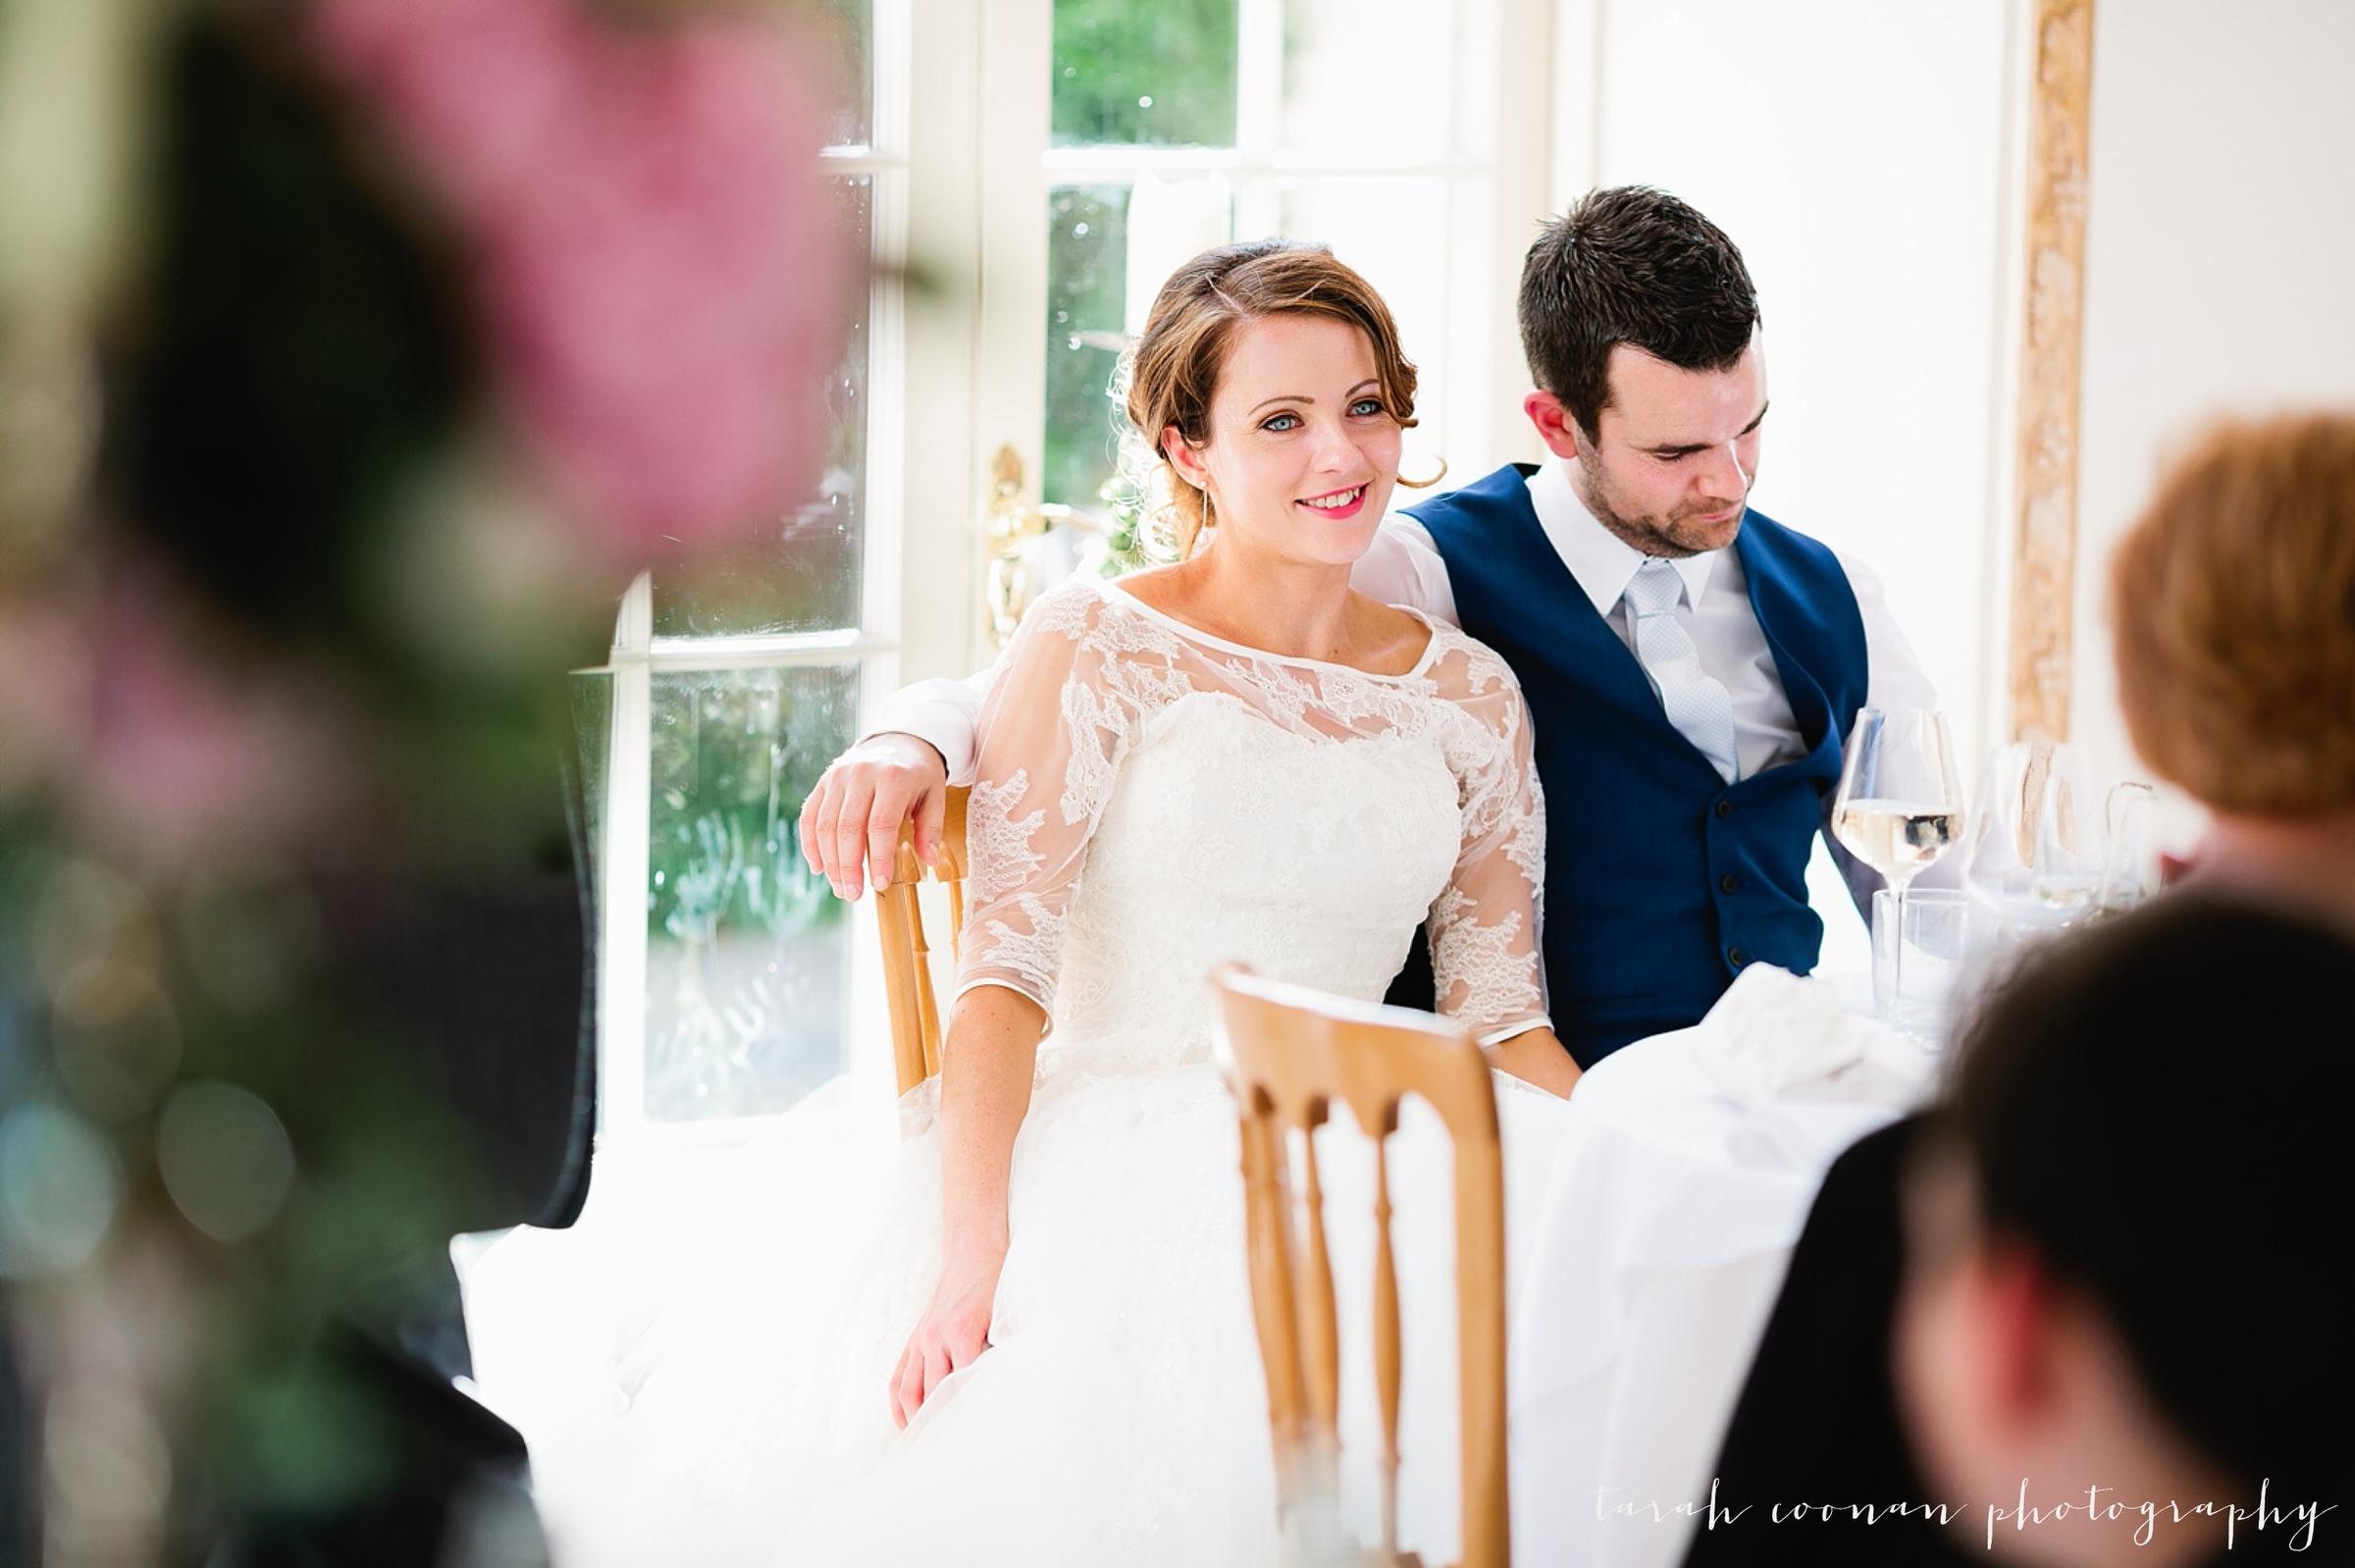 northbrook-park-wedding-photographer_069